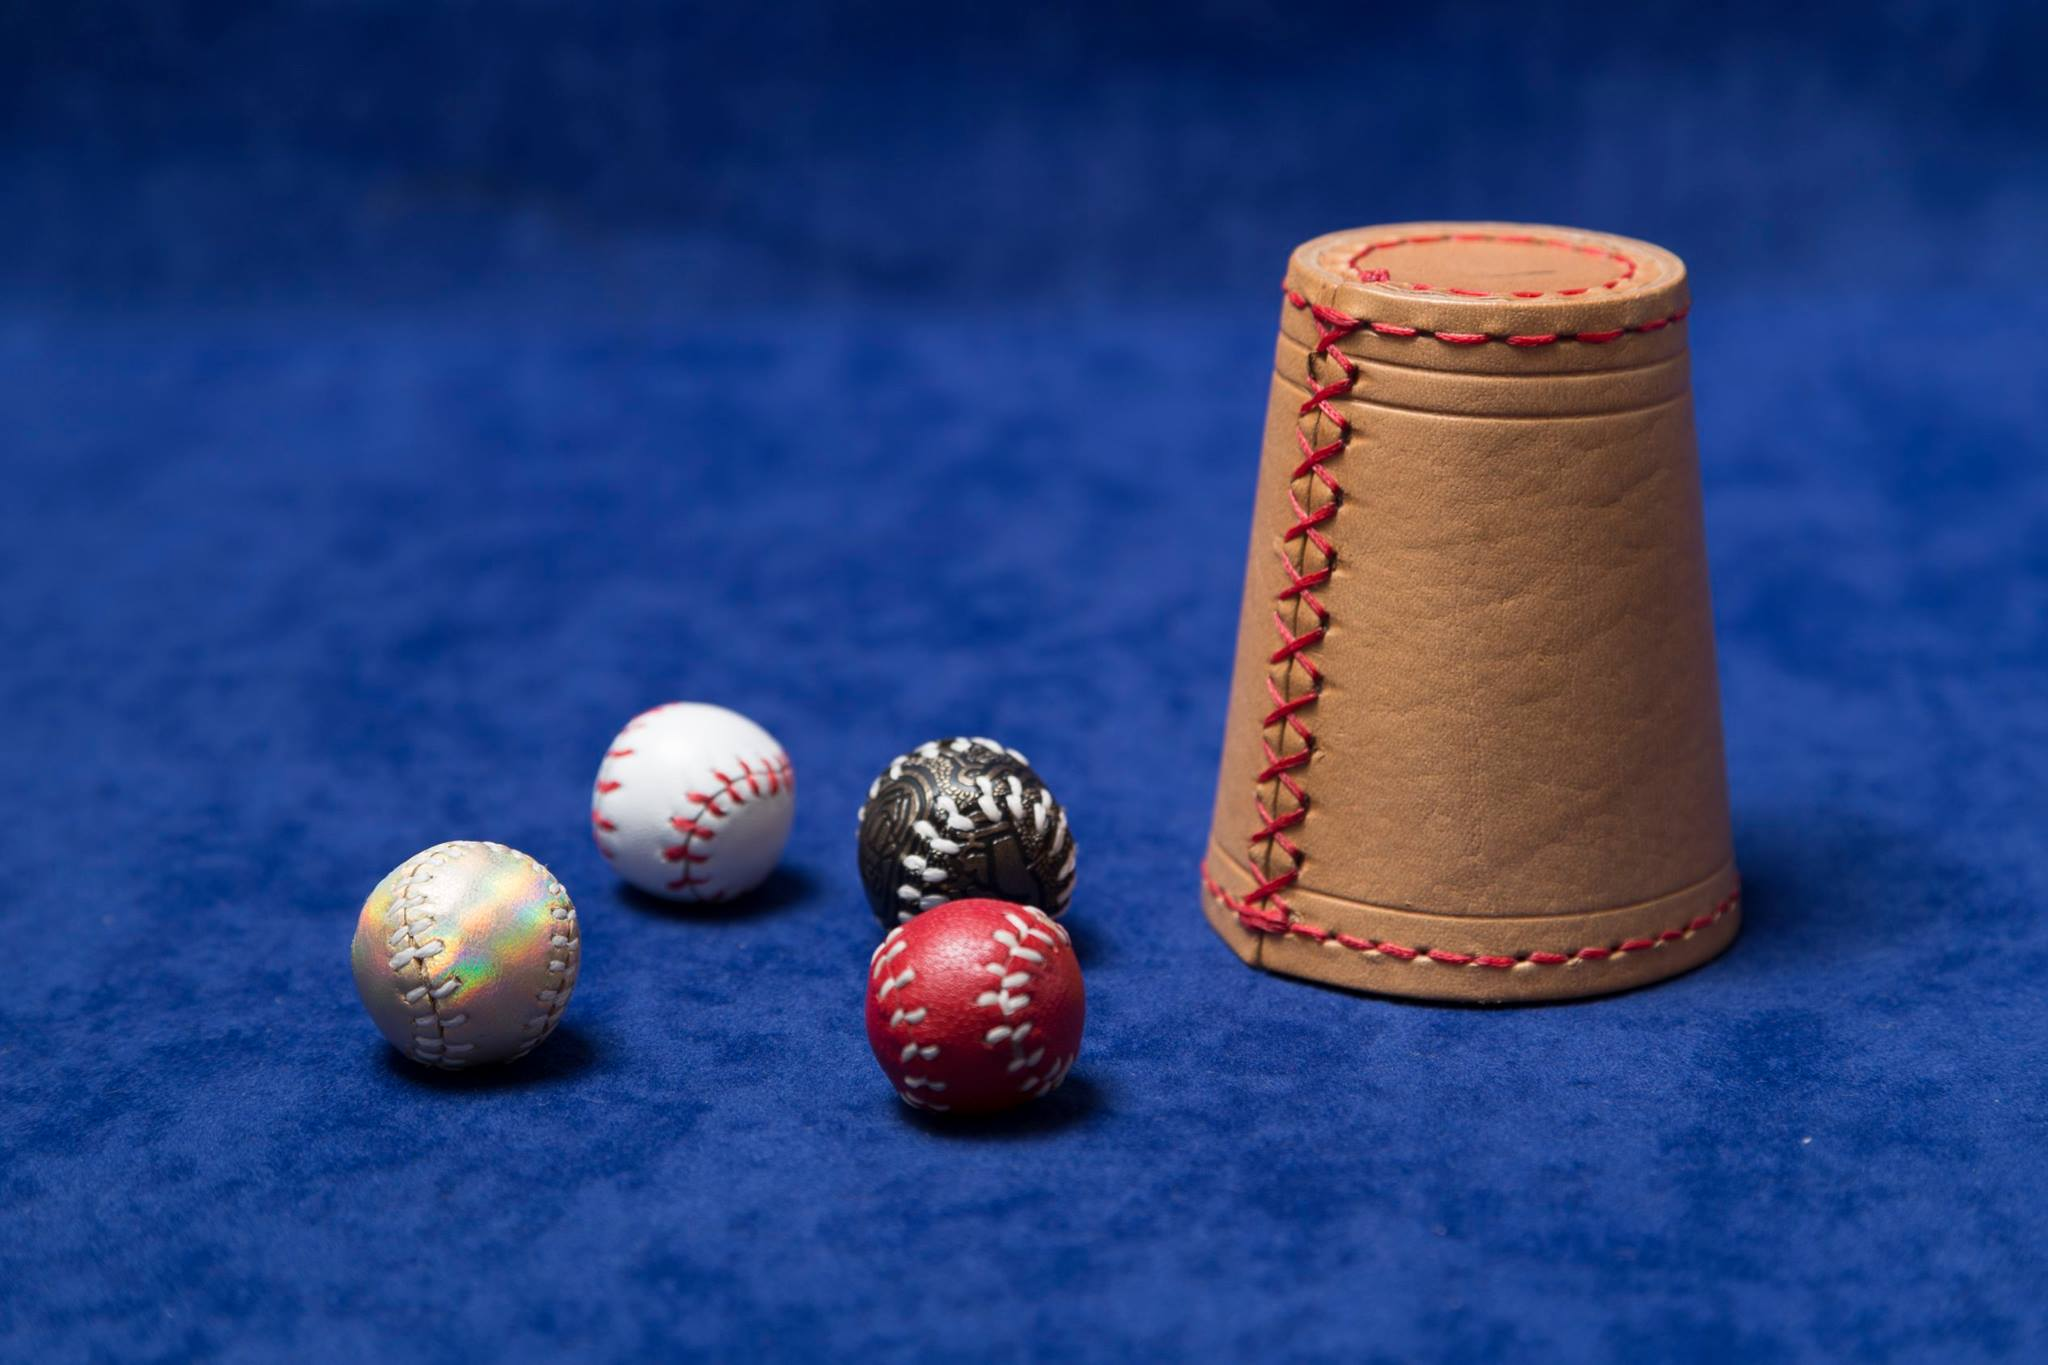 set-chop-cup-cuero-natural-2-bolas-2048x1365 | ilusionat.com